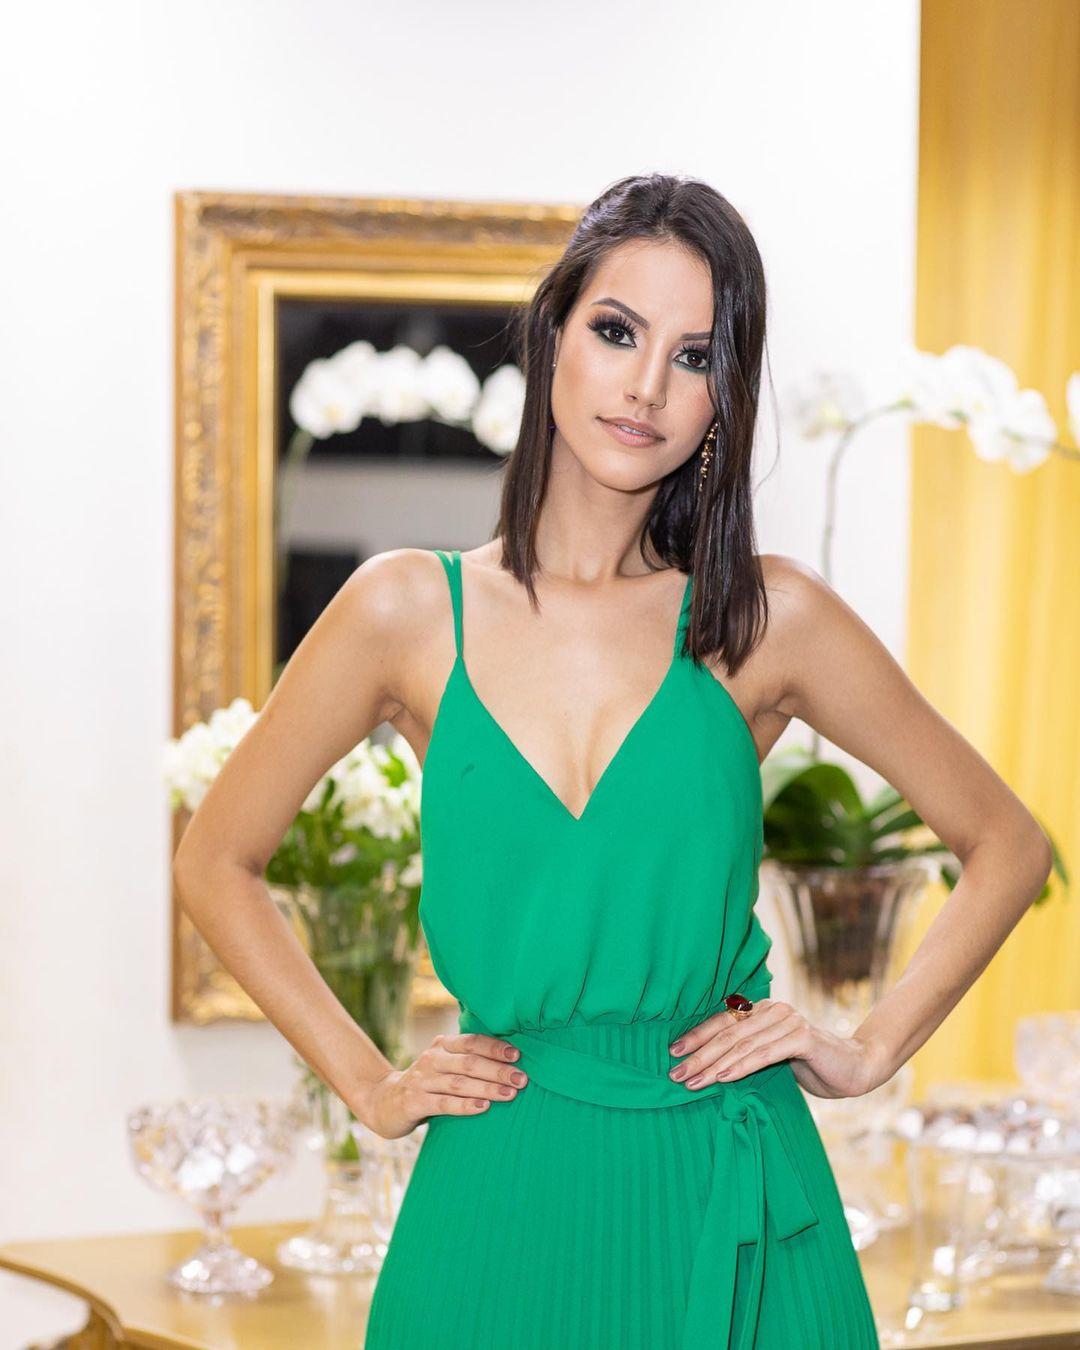 rafaella felipe, top 20 de miss brasil mundo 2019. - Página 9 74897413